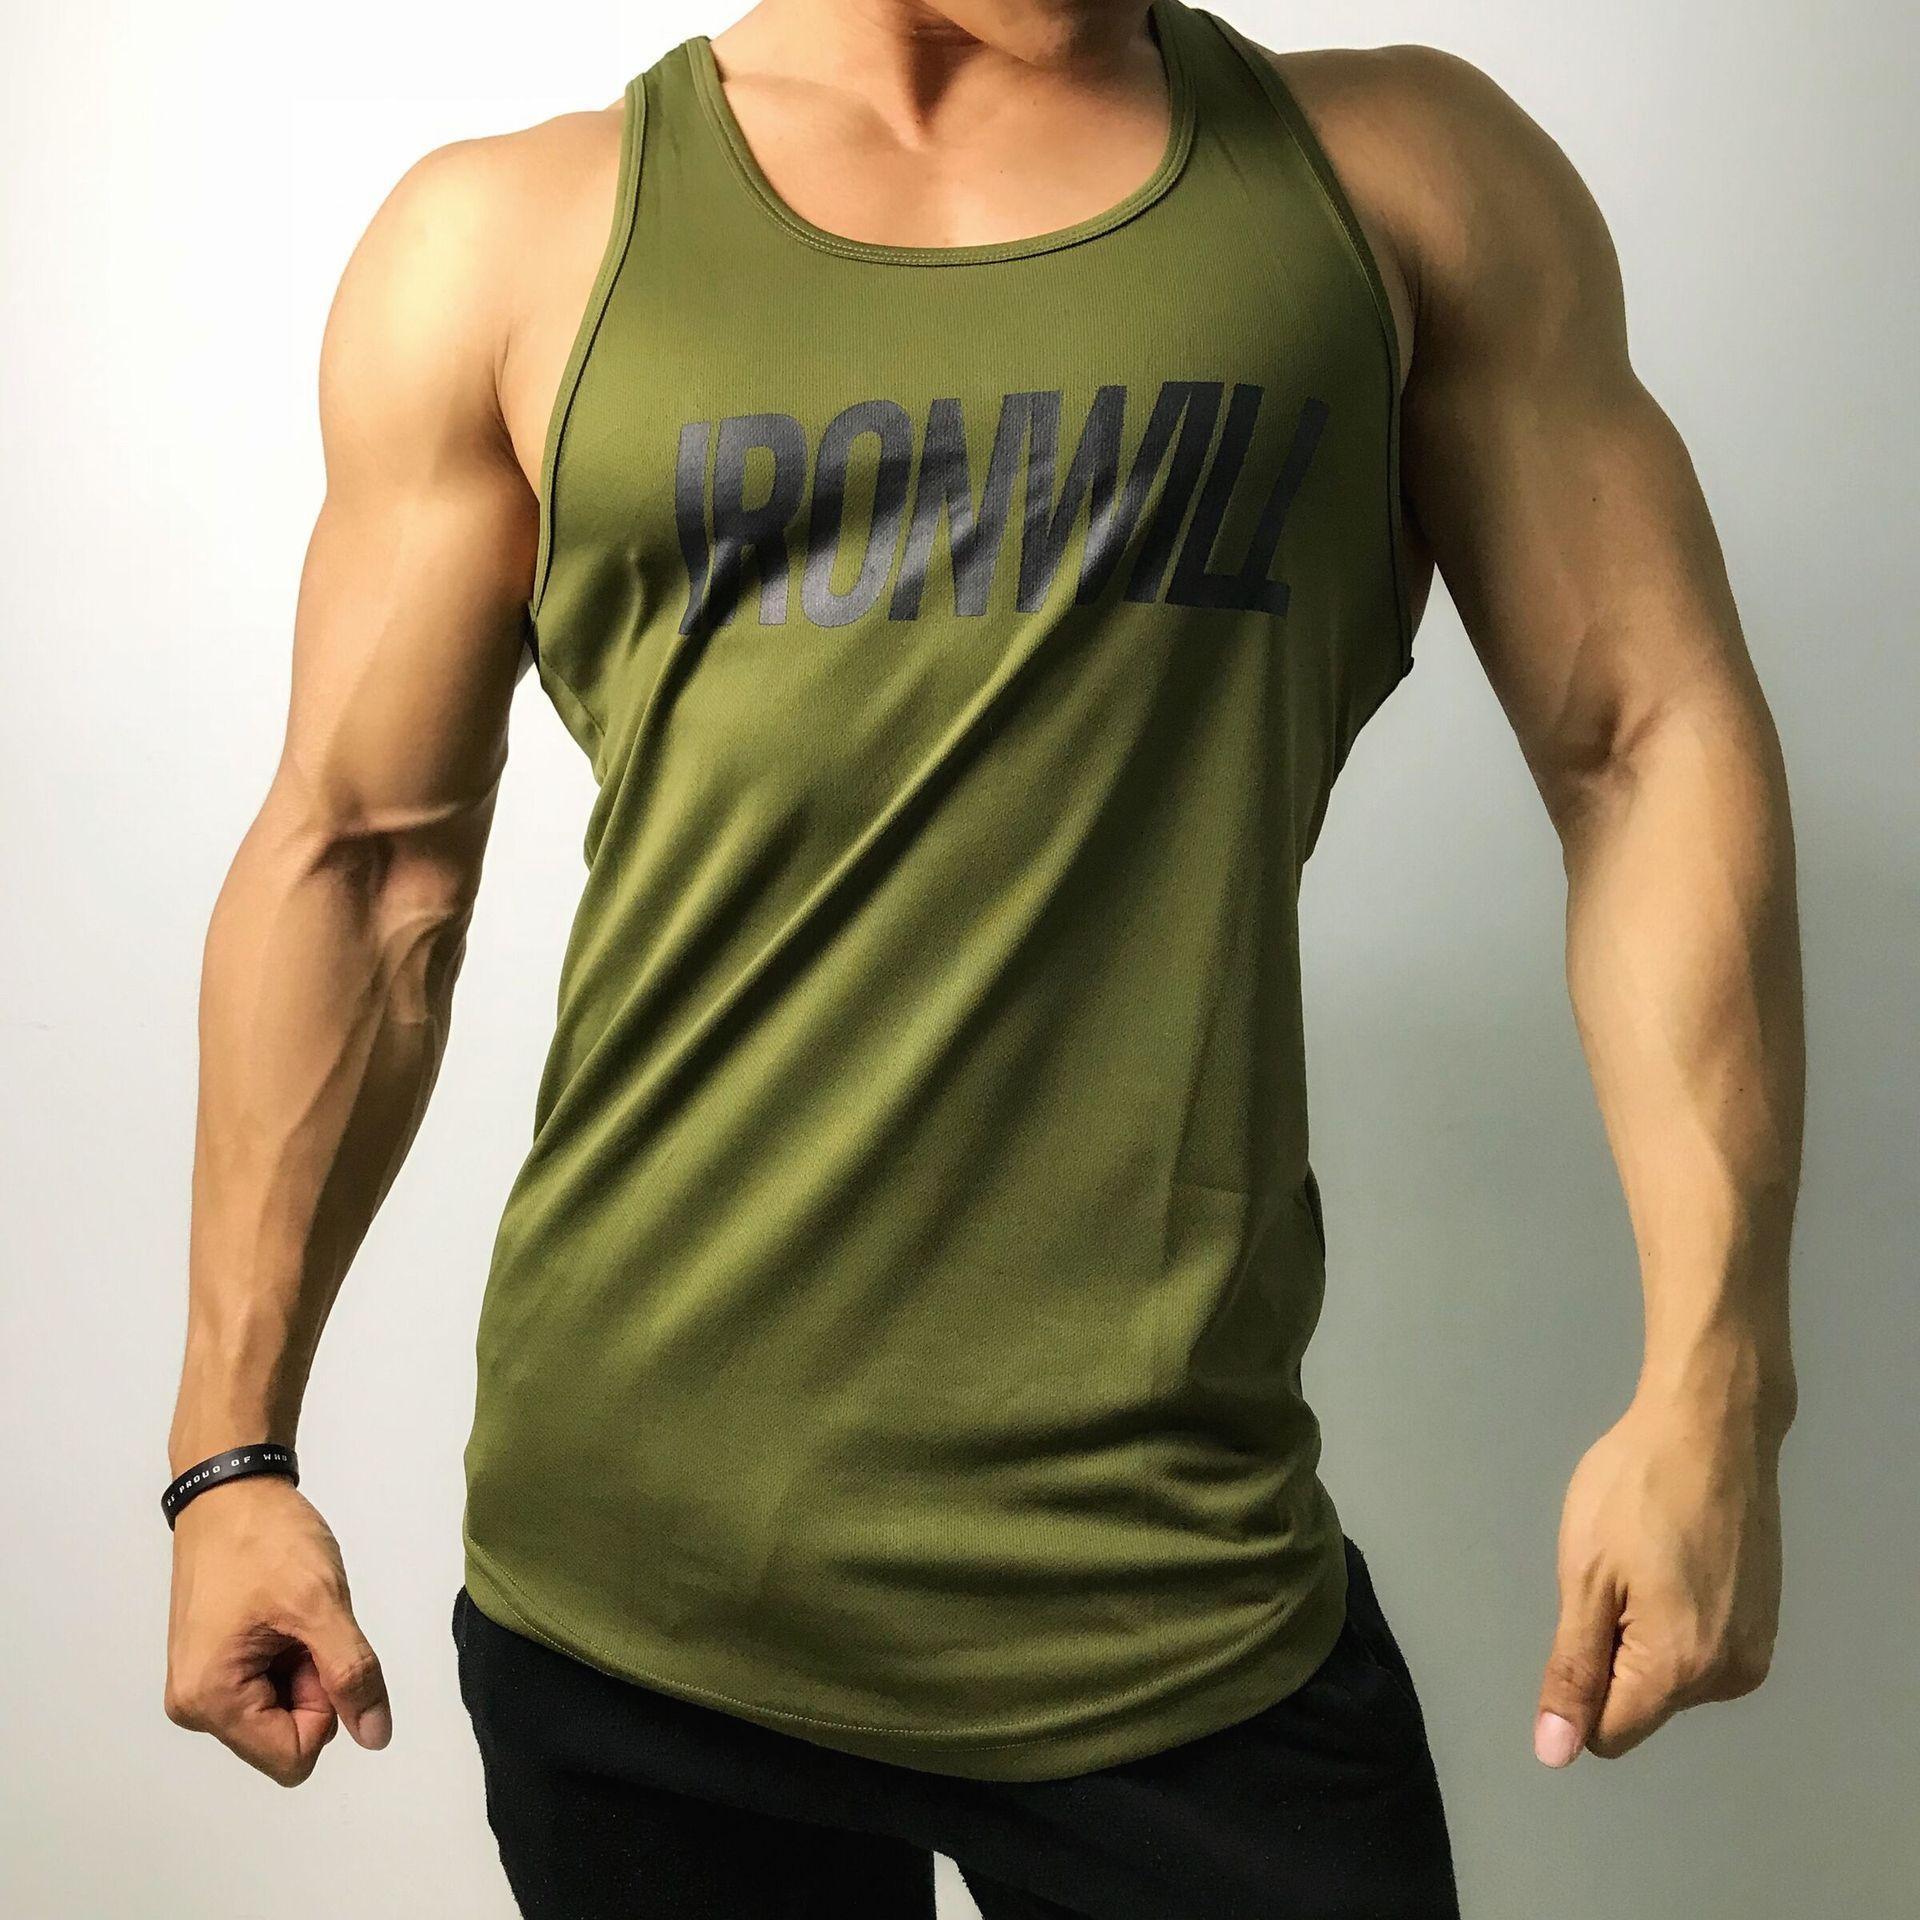 ae52d447 Vest Sleeveless T-shirt Men 2019 Summer Green New Sports Fitness Gym  Running Workout Casual Cotton Polyester Men's Round Neck Shirt